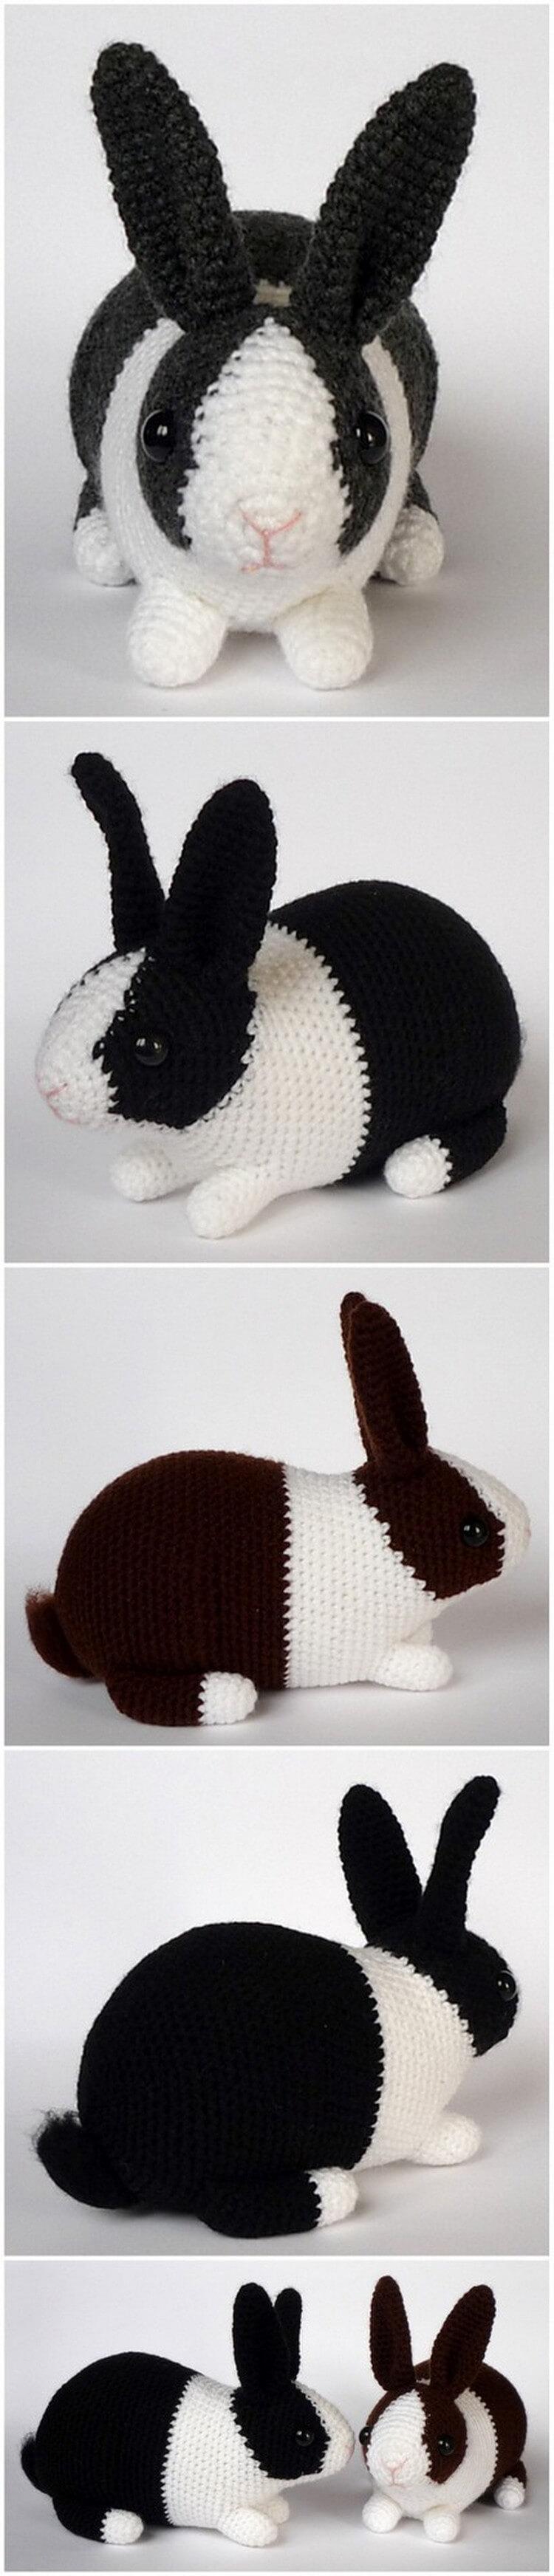 Crochet Amigurumi Pattern (88)